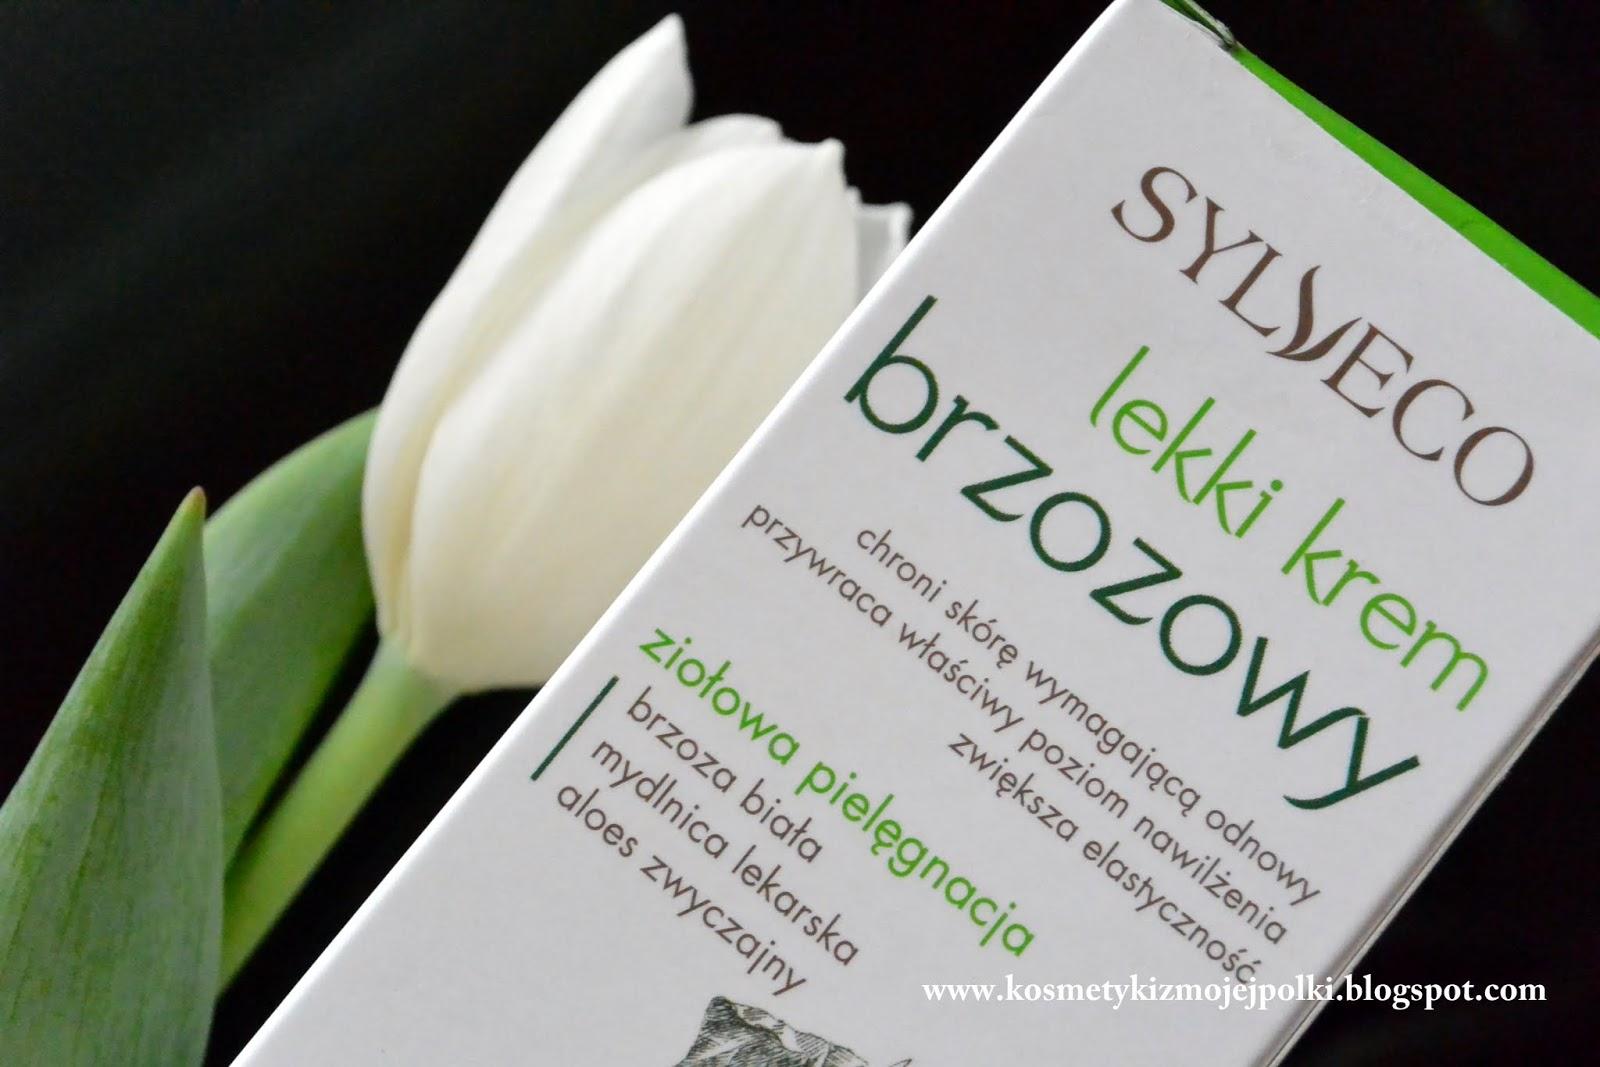 Hipoalergiczny Lekki Krem brzozowy / SYLVECO